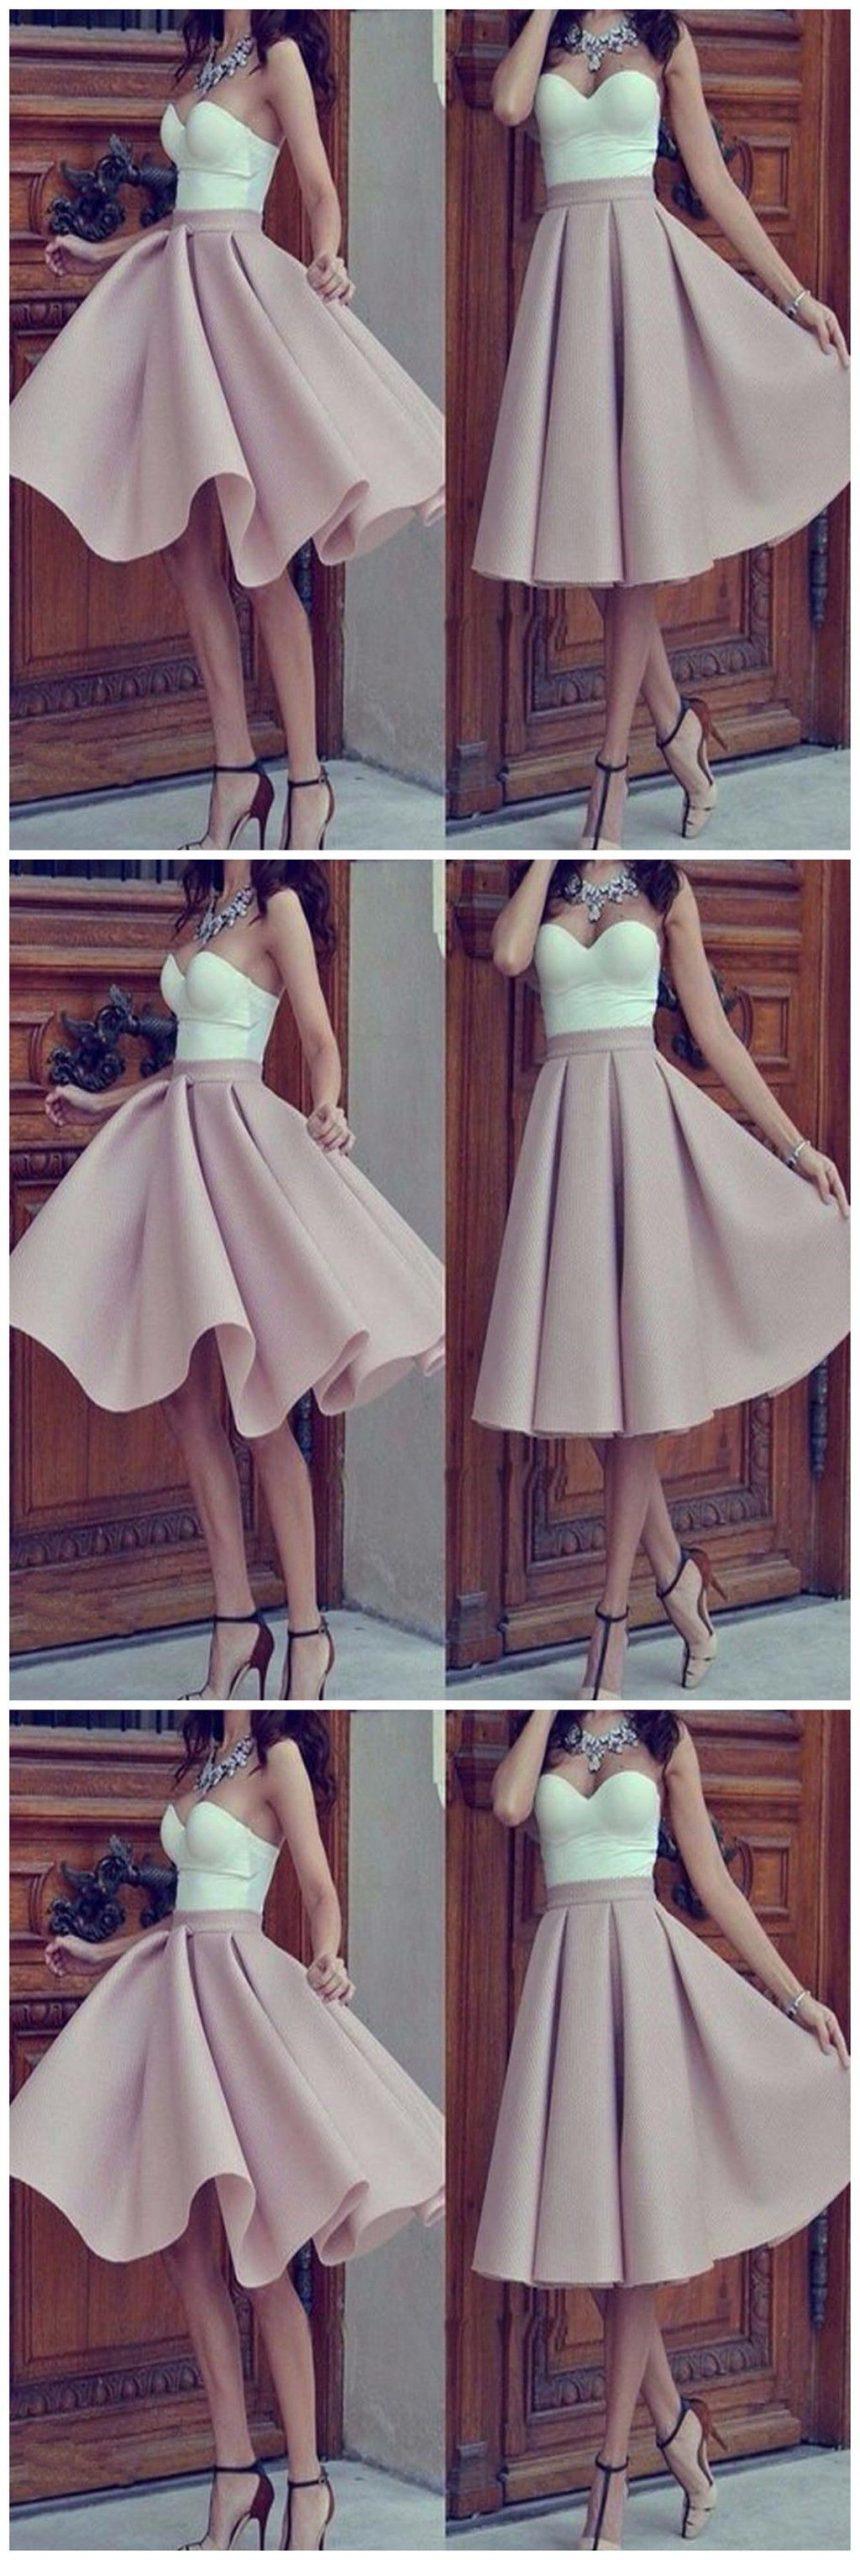 Designer Luxurius Abendkleider Quiero Spezialgebiet20 Coolste Abendkleider Quiero Boutique